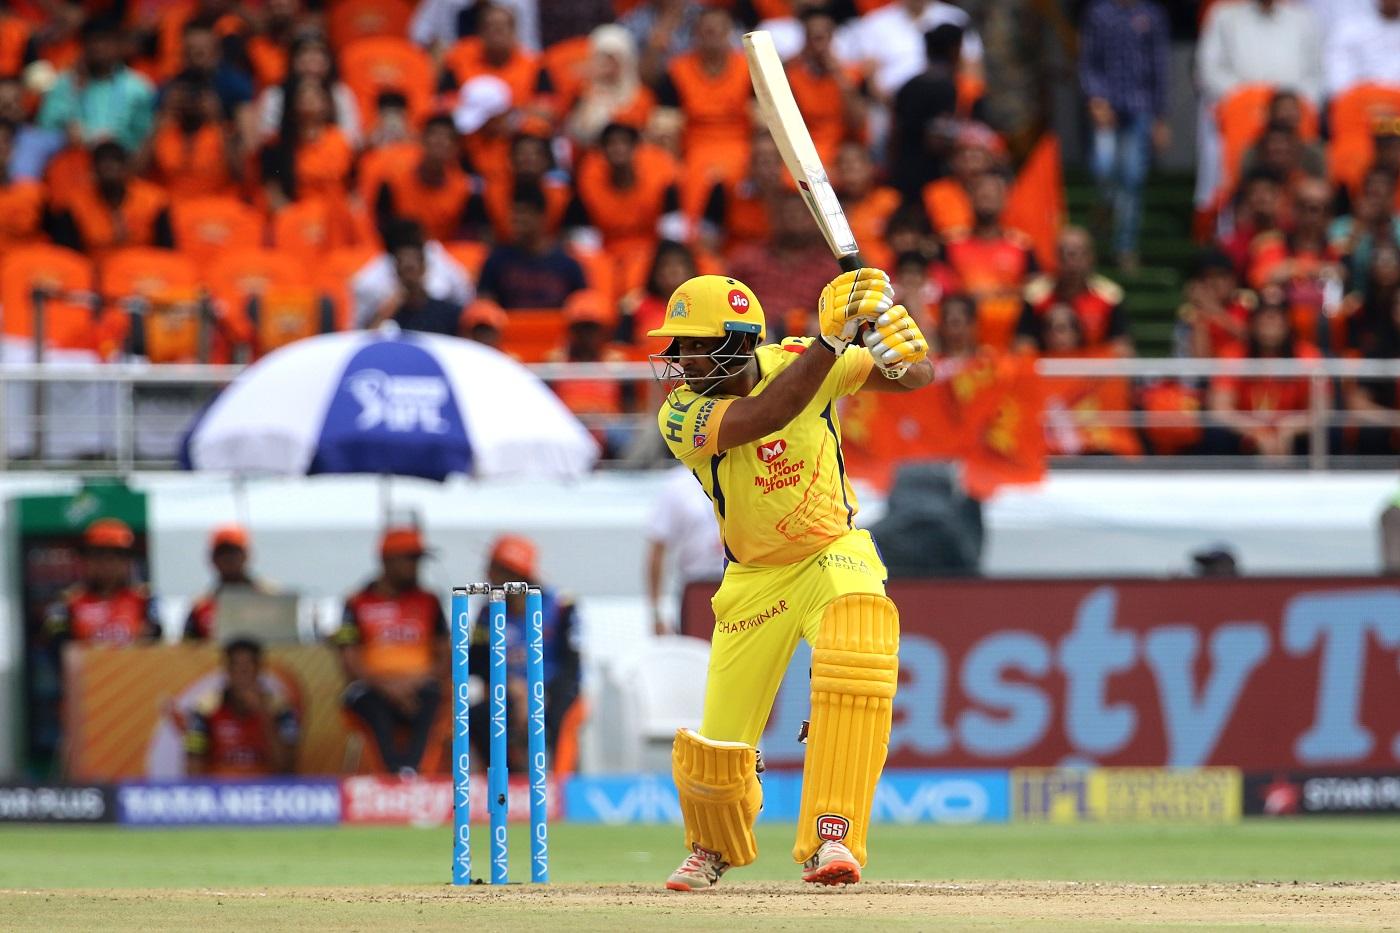 IPL 2018: Chennai Super Kings - Road to the Final of Season XI